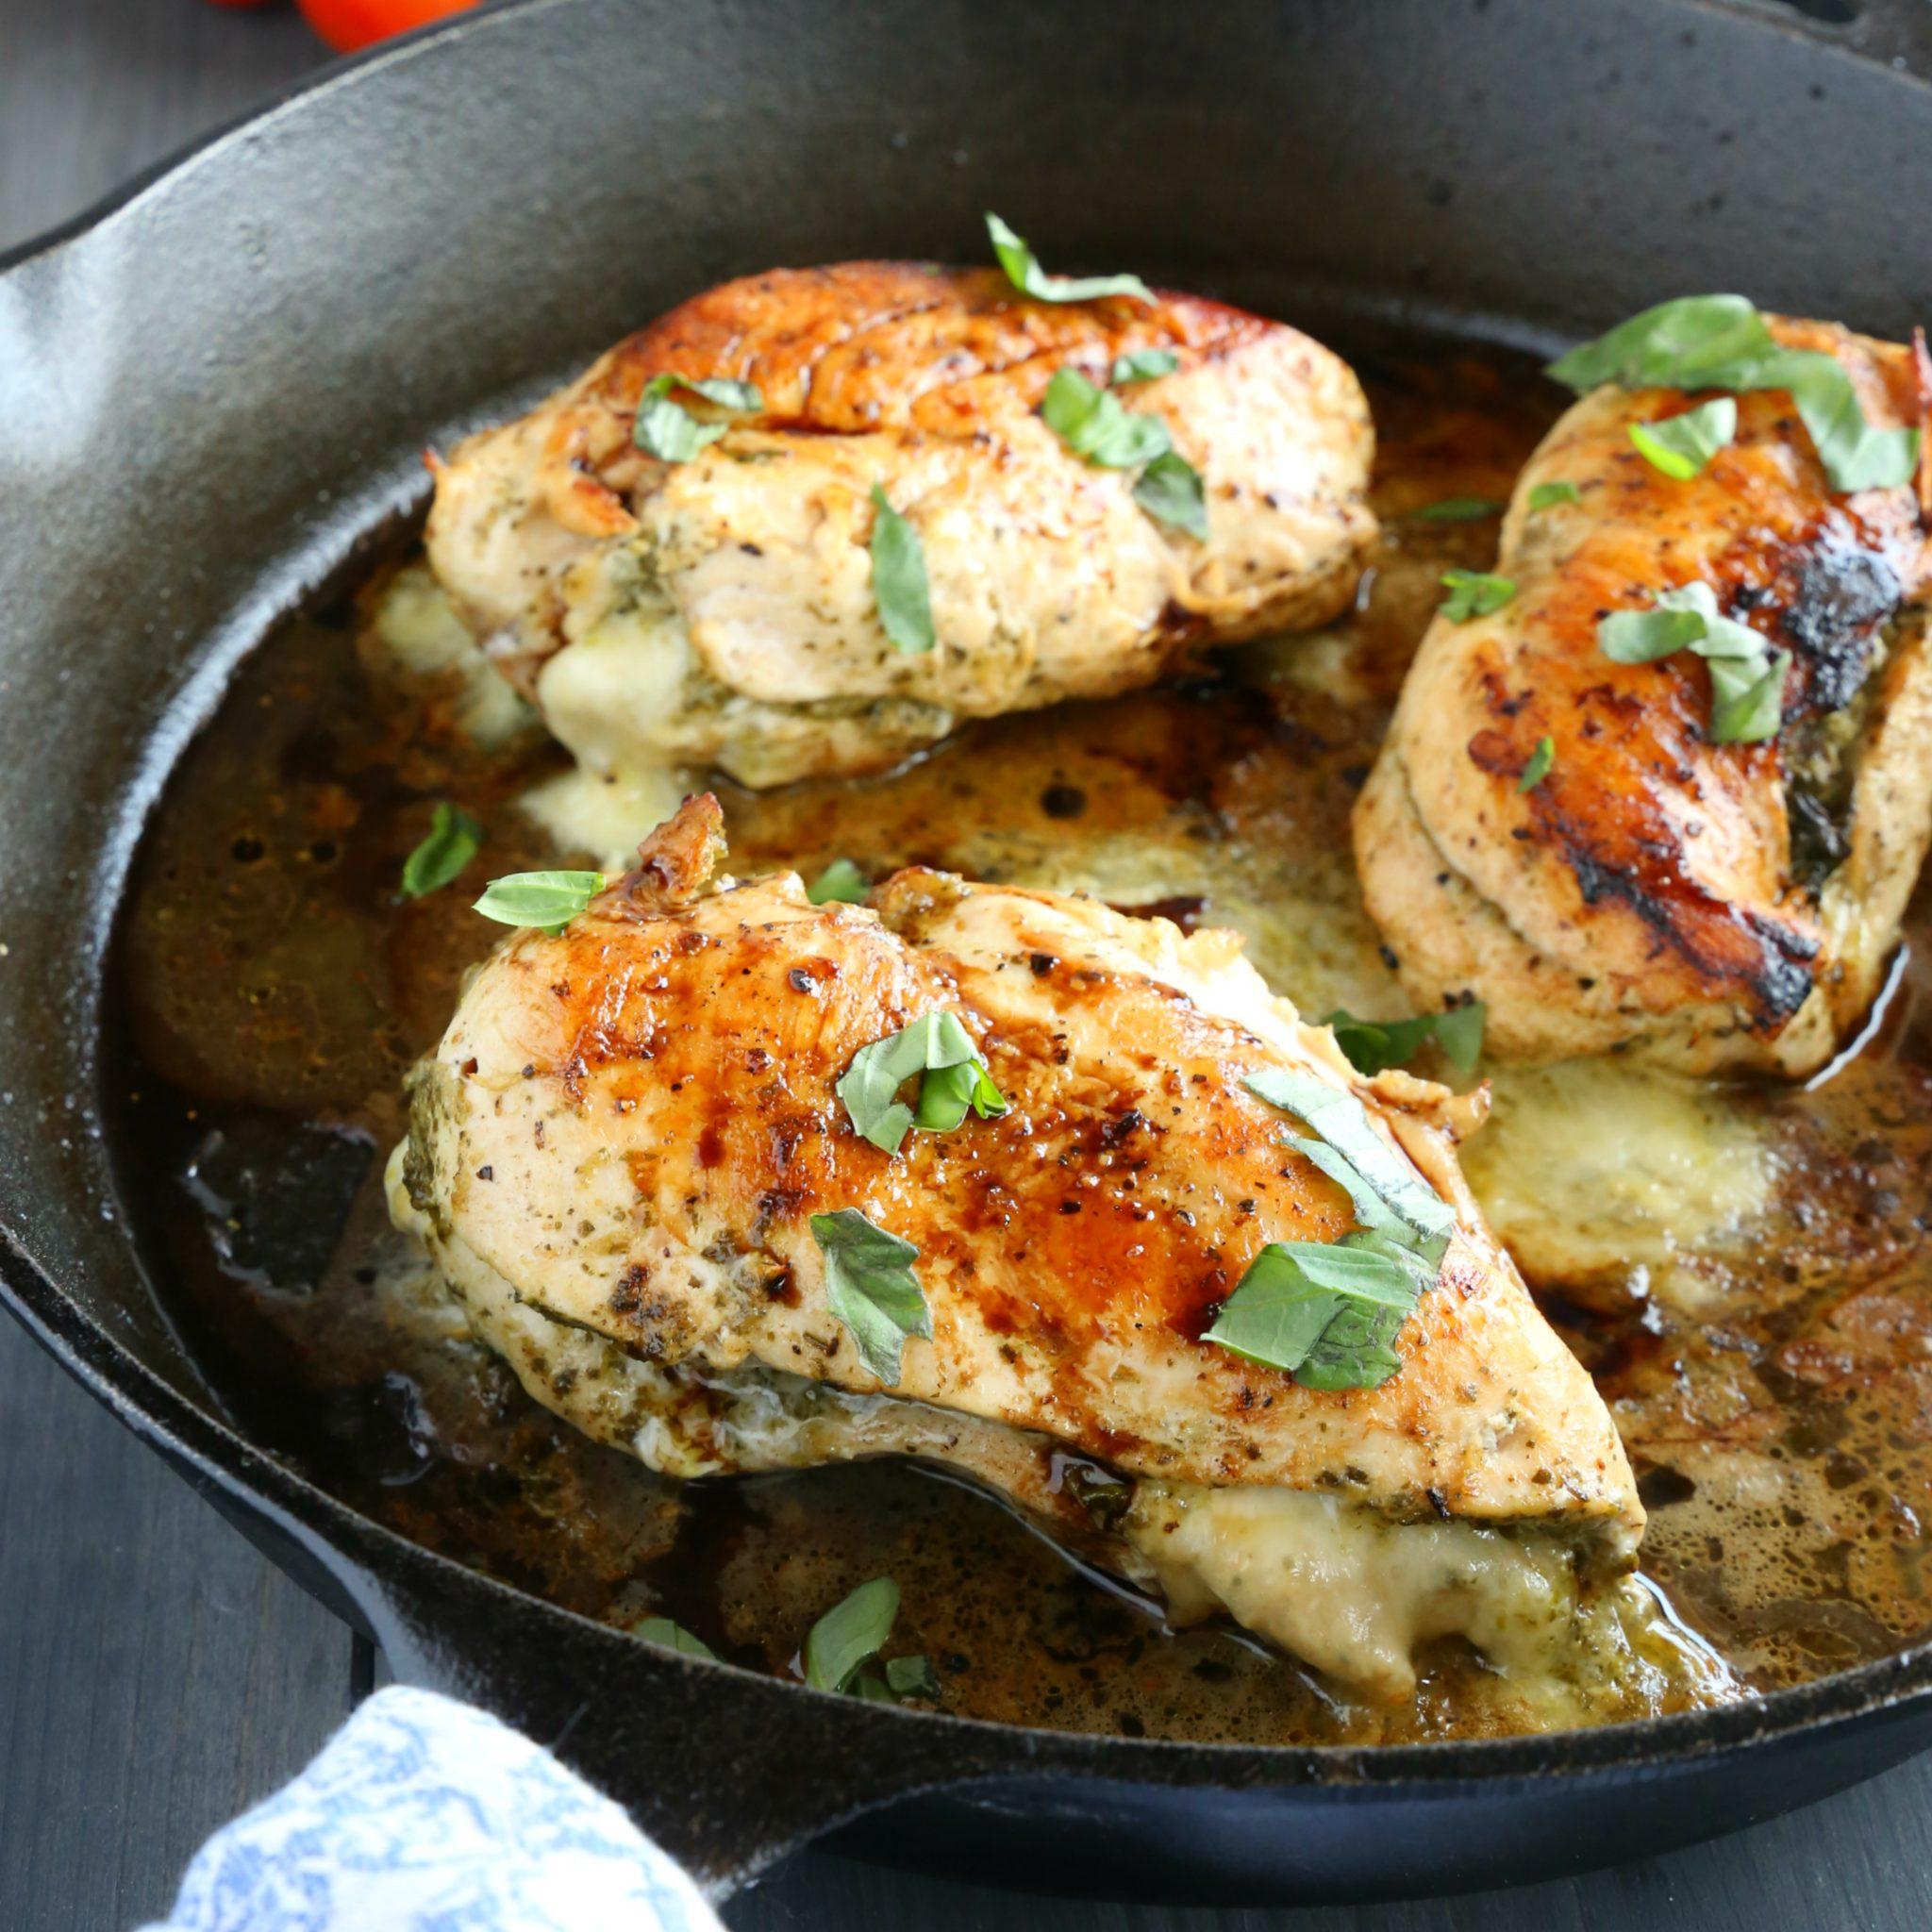 Skillet Pesto Caprese Stuffed Chicken The Busy Baker